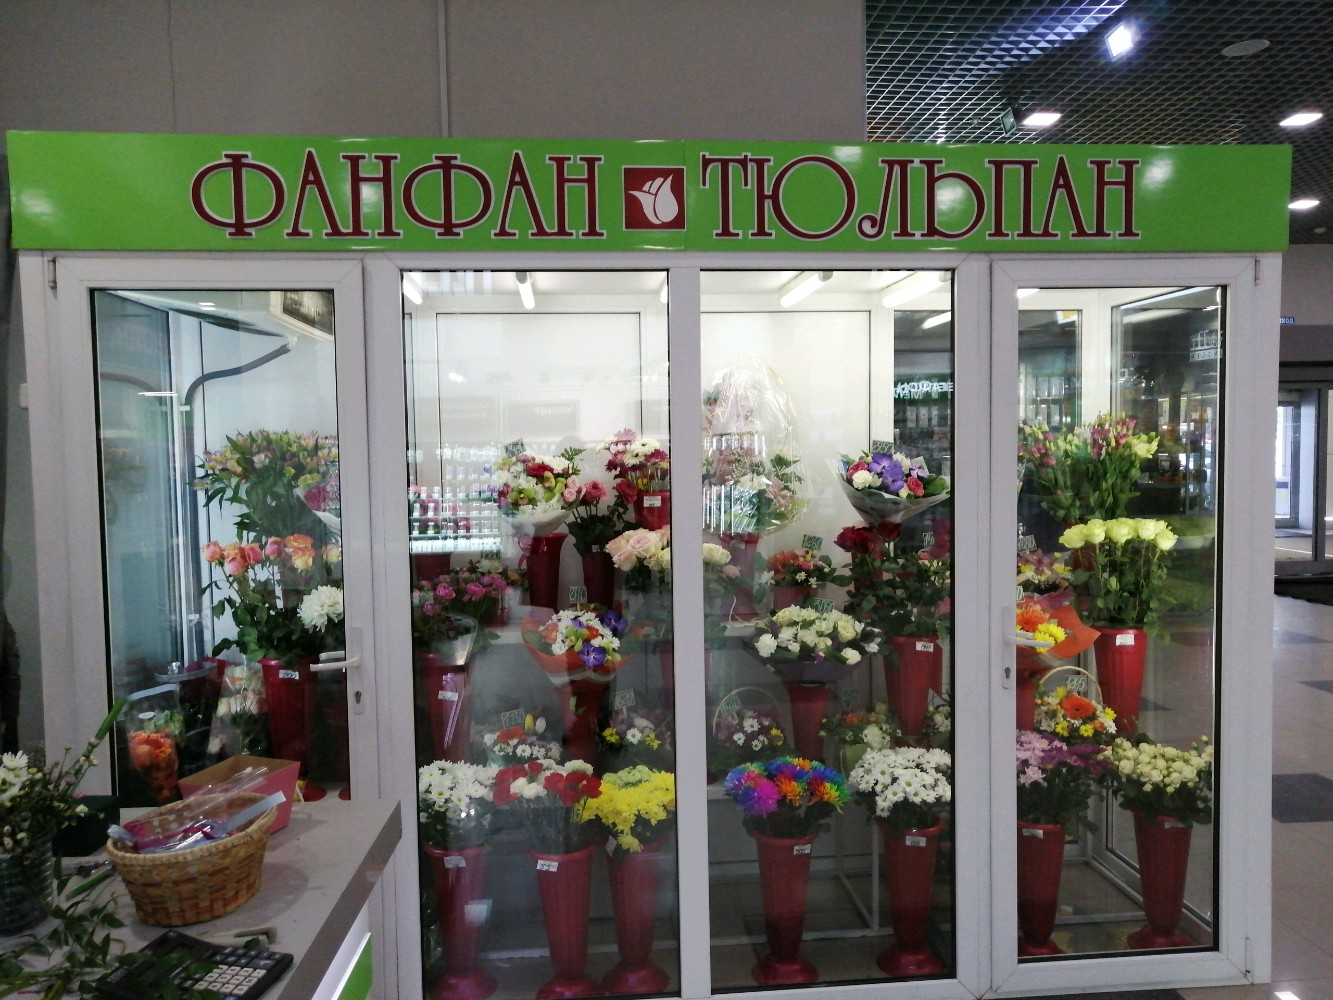 Фанфан тюльпан магазин цветов пенза, магазин цветов заказ